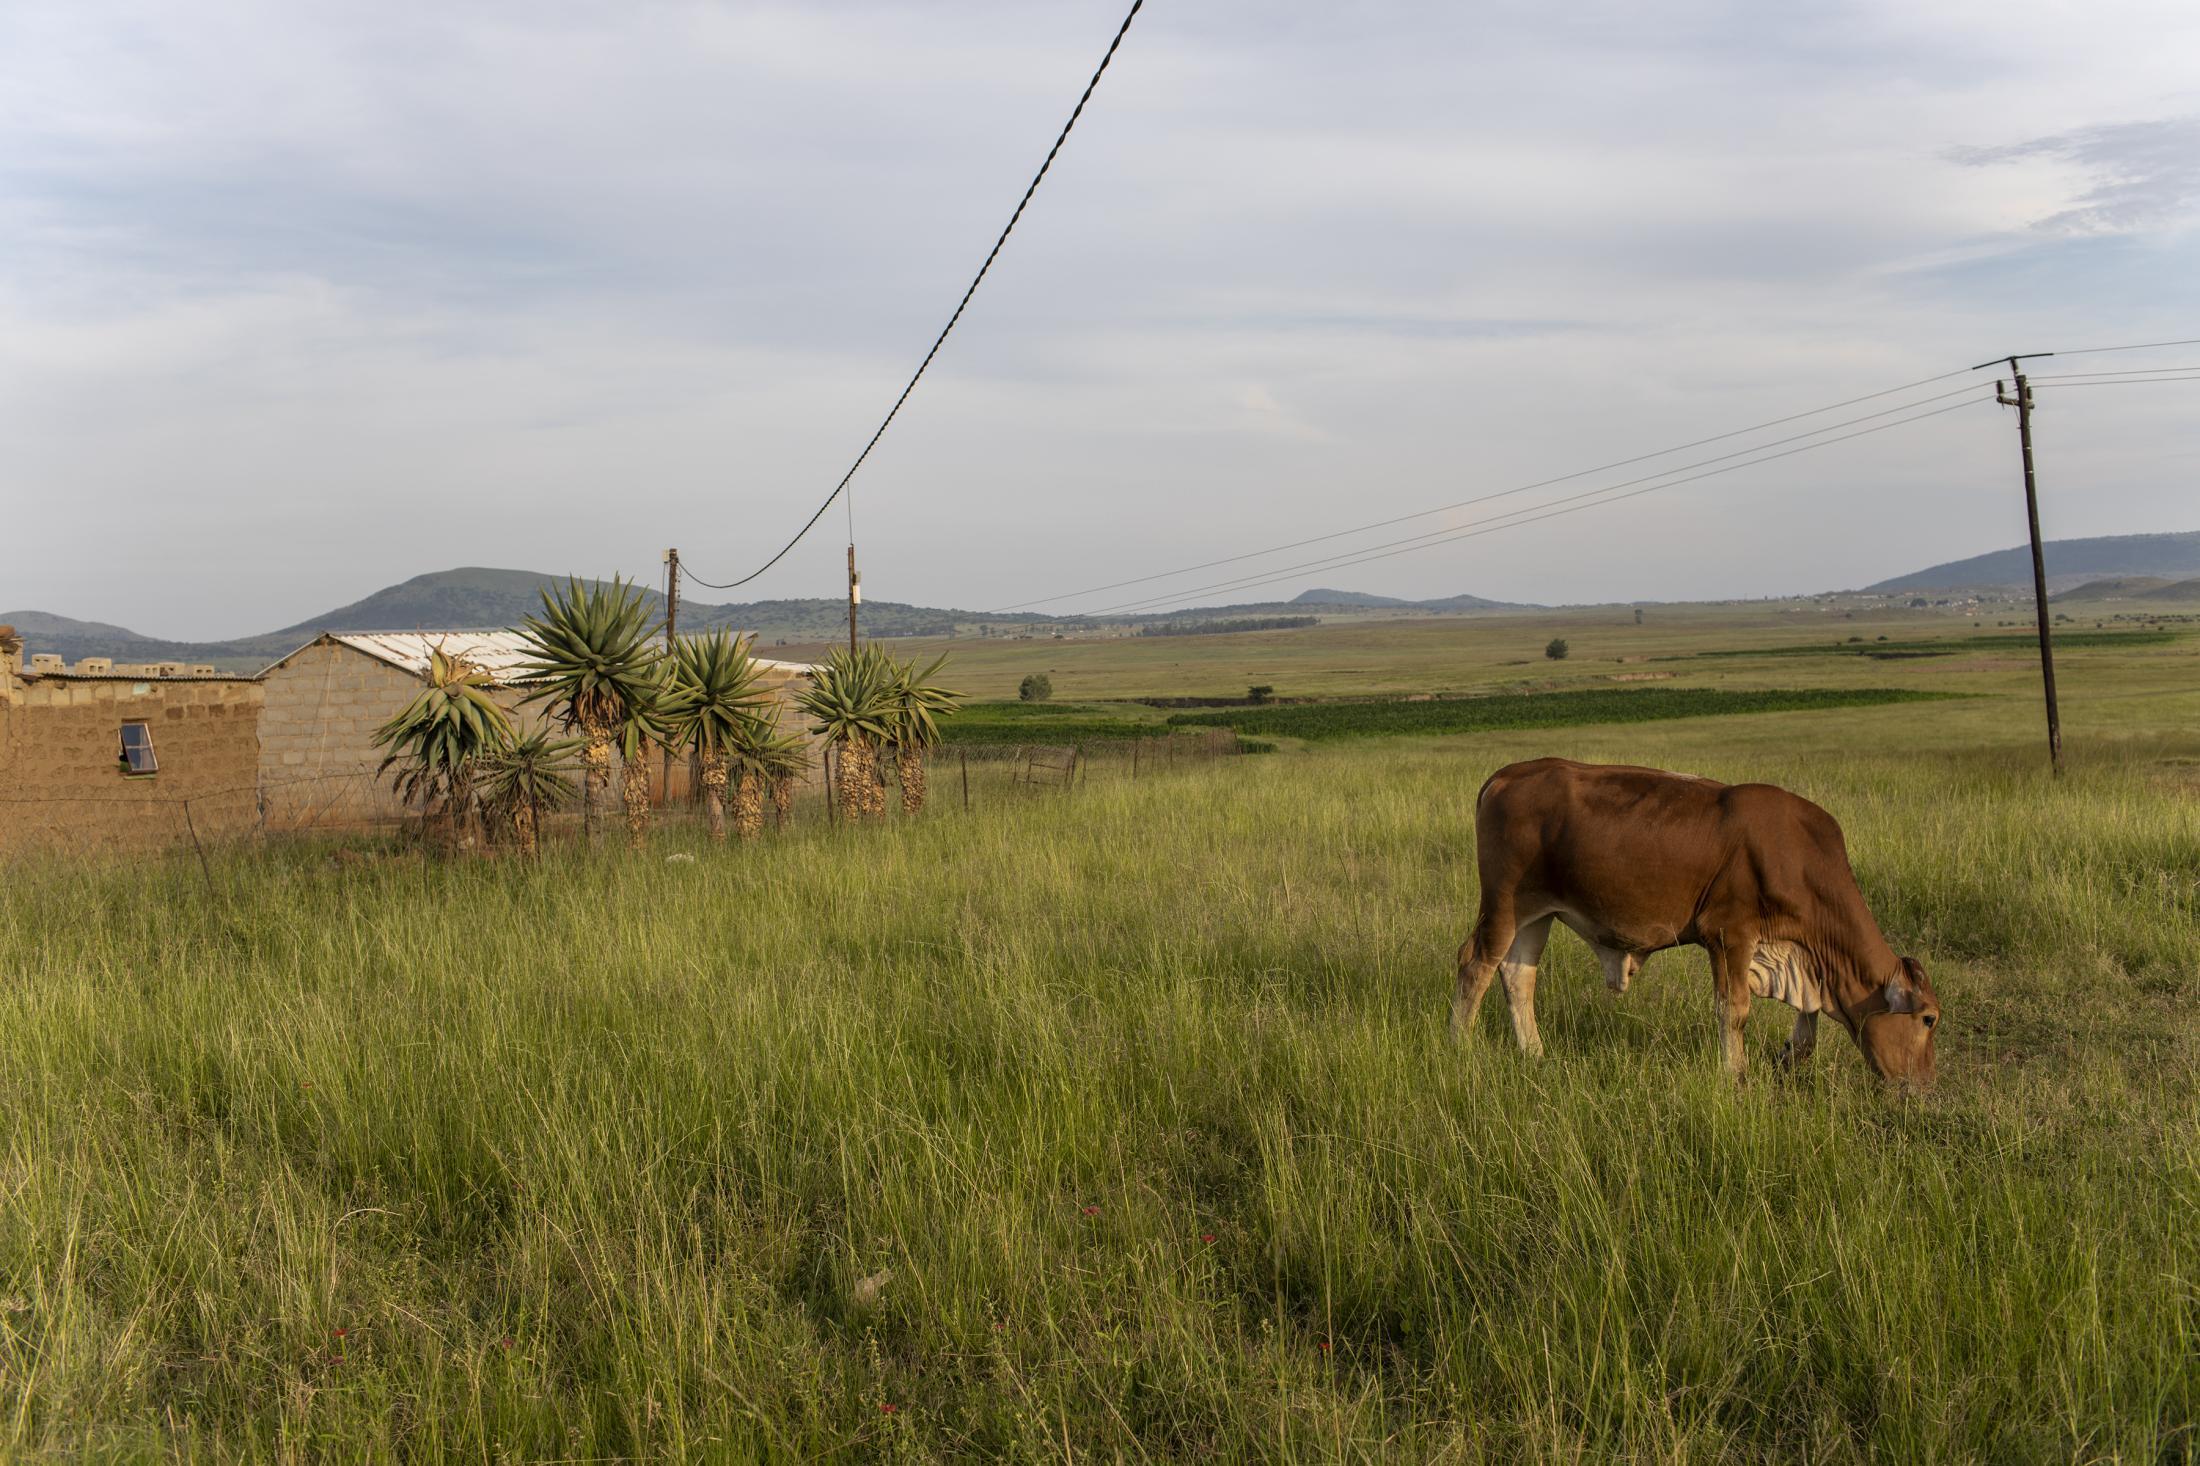 17 February 2020: Cattle roam the veld in Watersmeet, Ladysmith, Kwa-Zulu Natal.